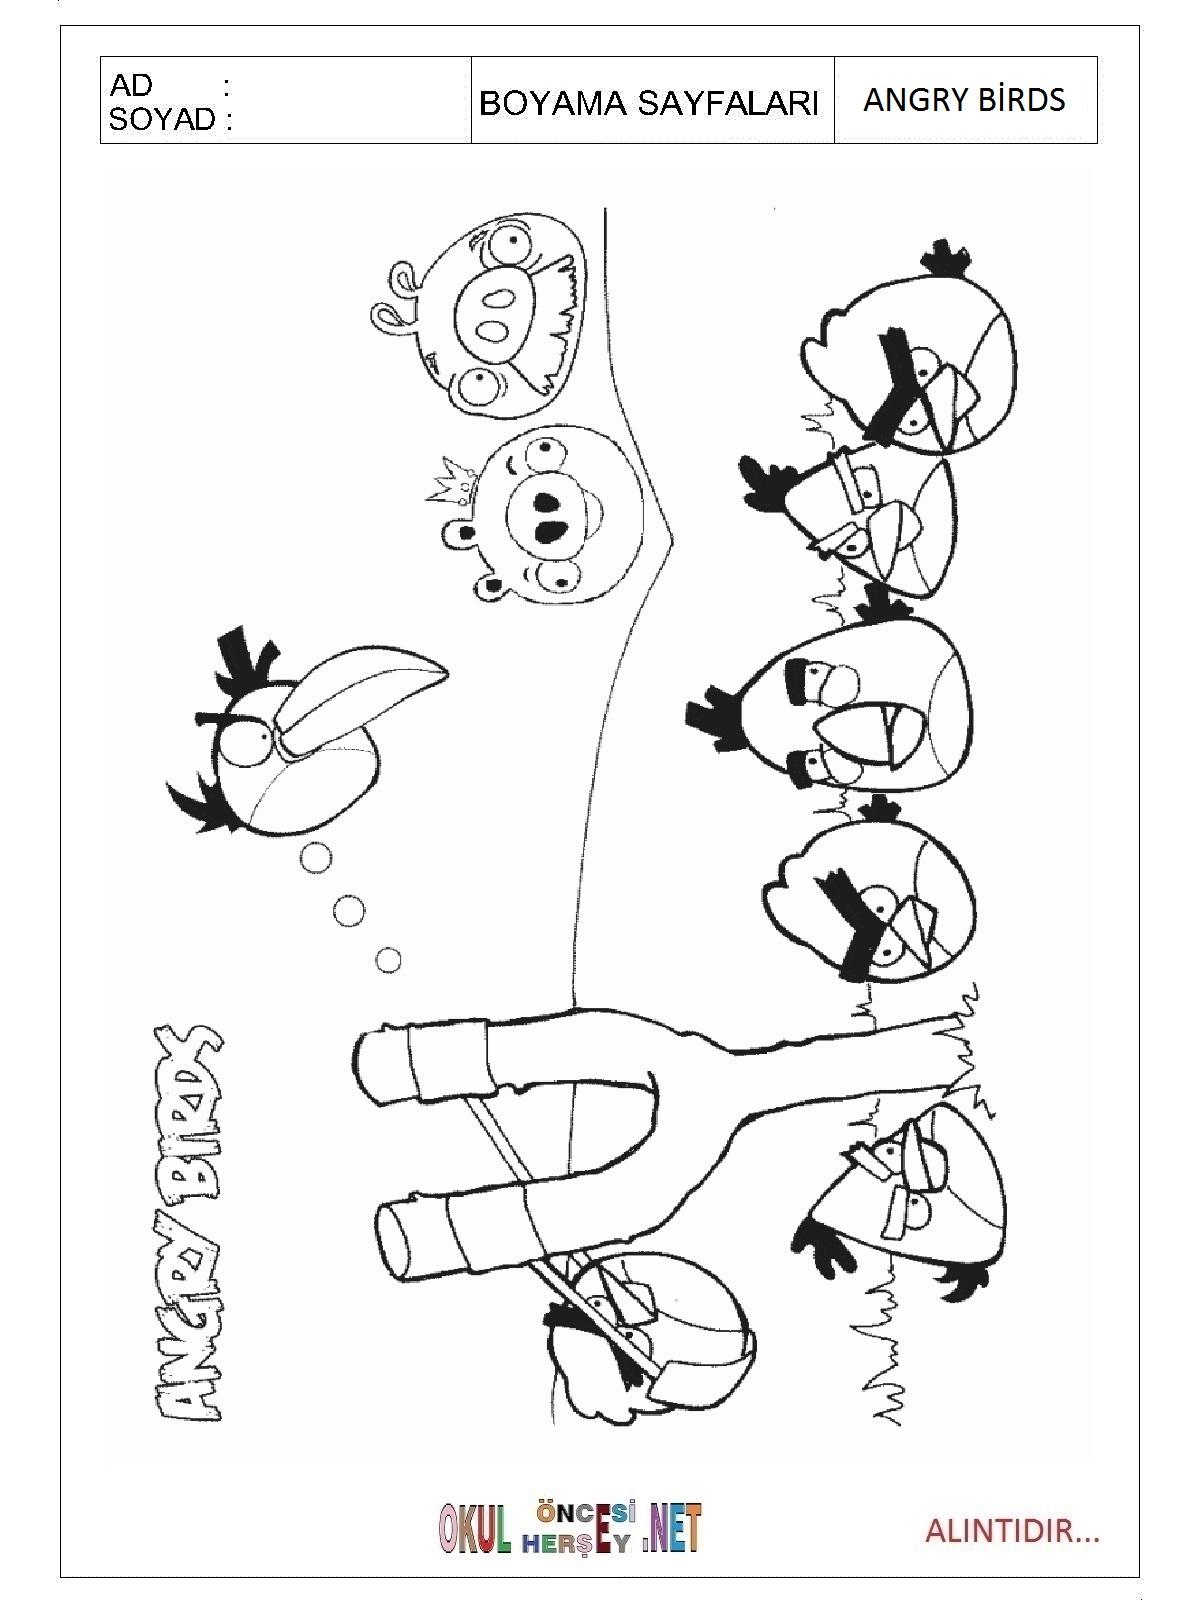 Angry Birds Boyama Sayfalari